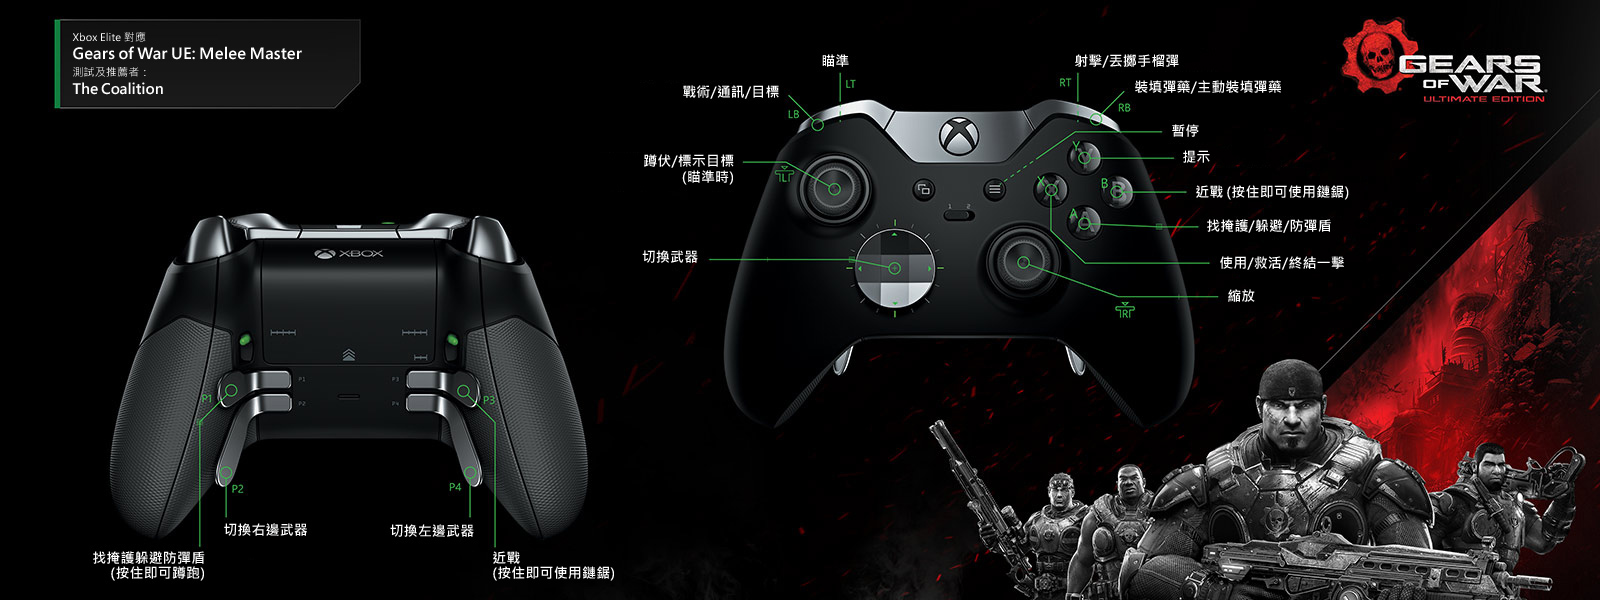 Gears of Wars Ultimate Edition 終極版 – Melee Master Multiplayer Elite 配對功能